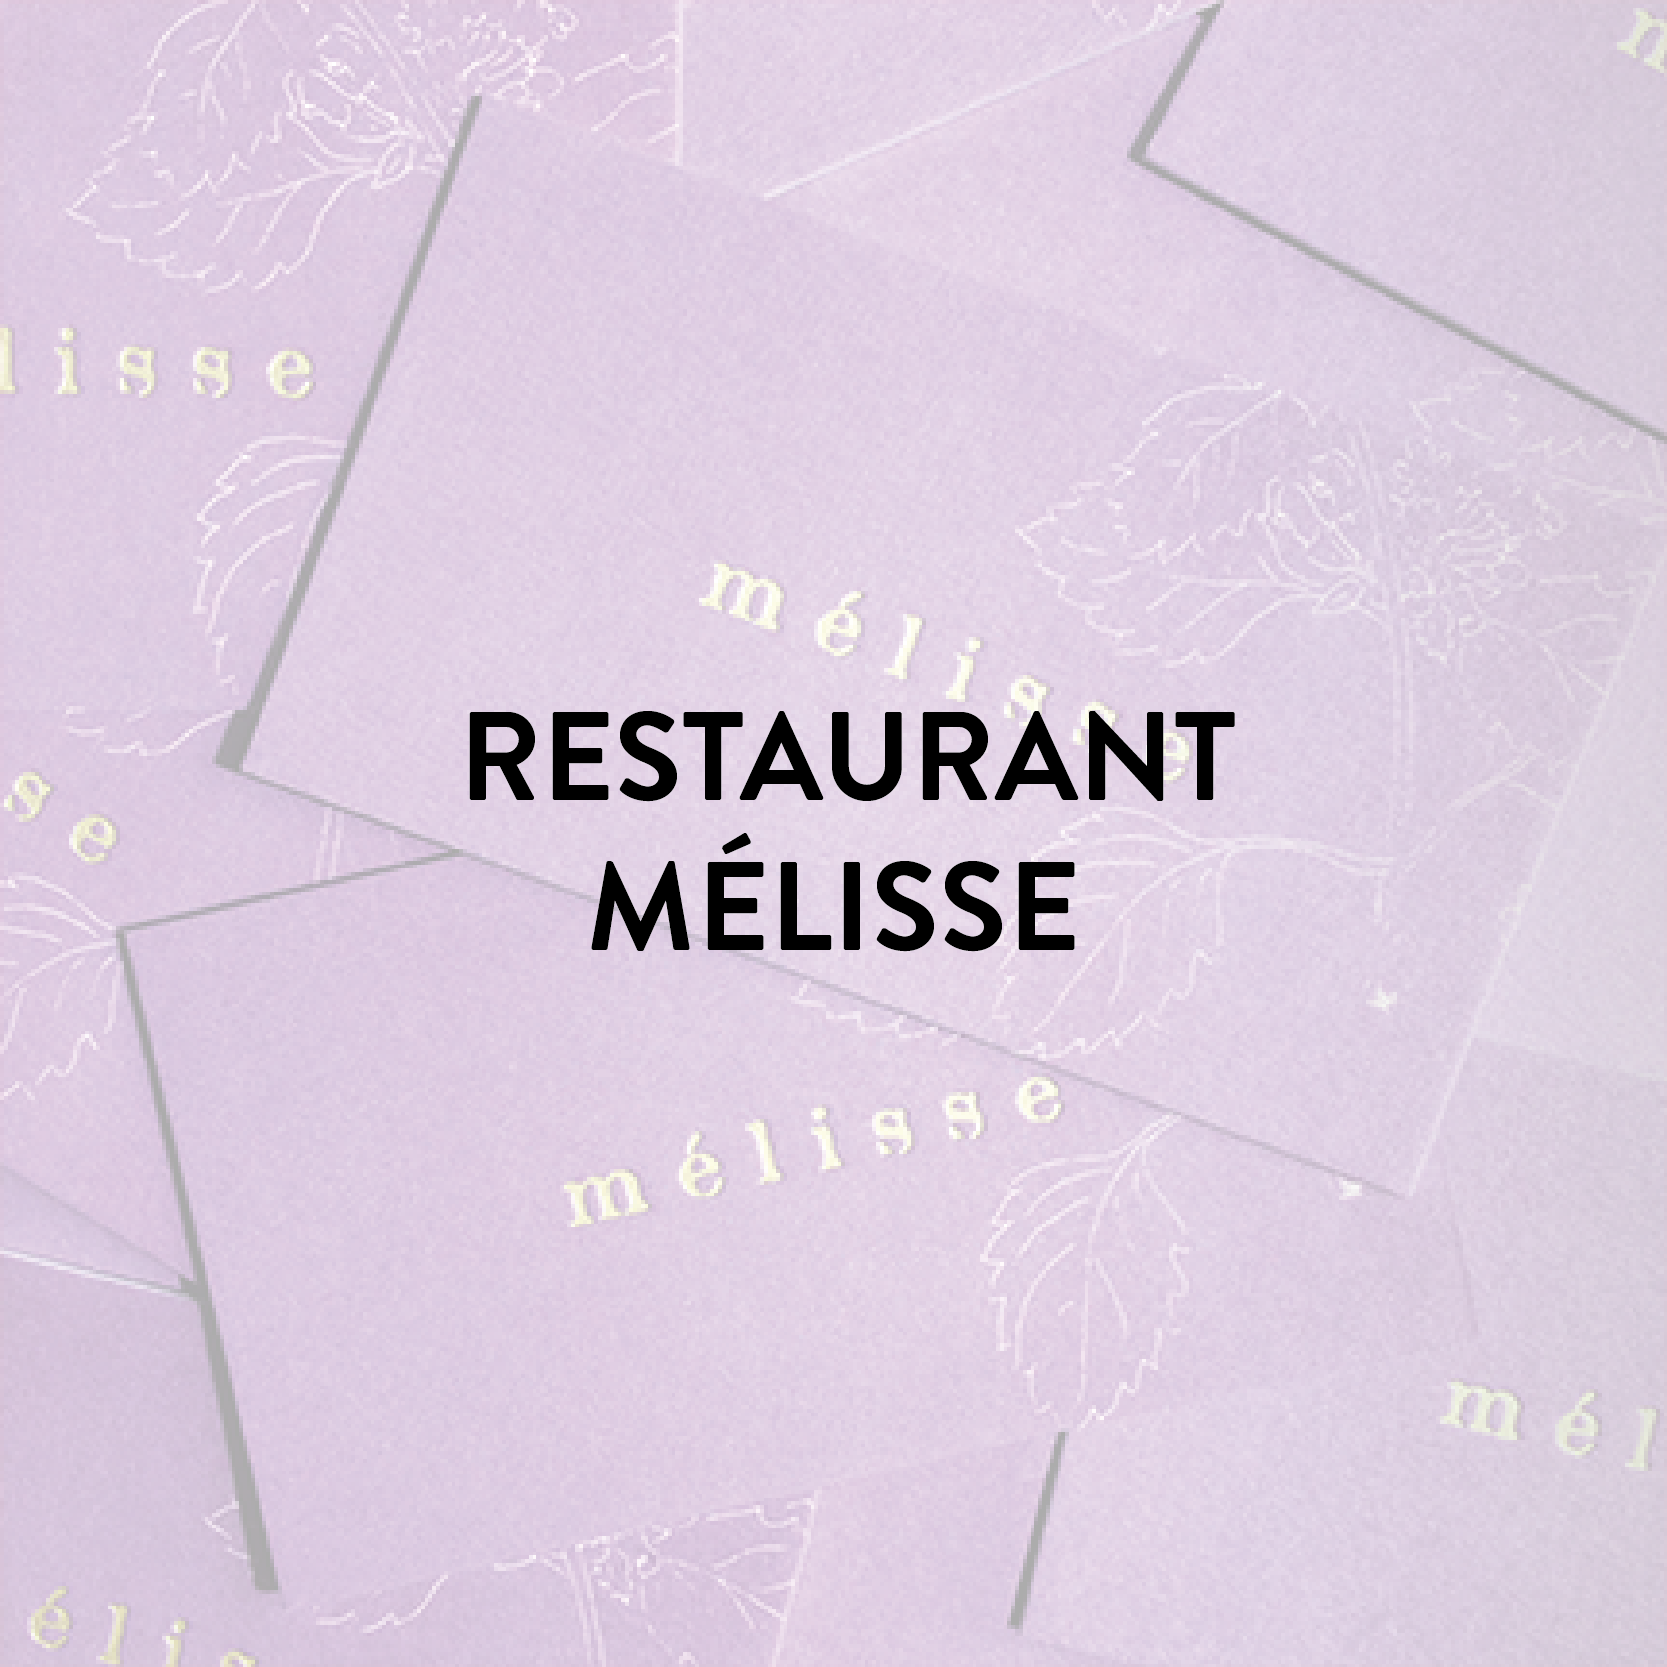 Restaurant Mélisse